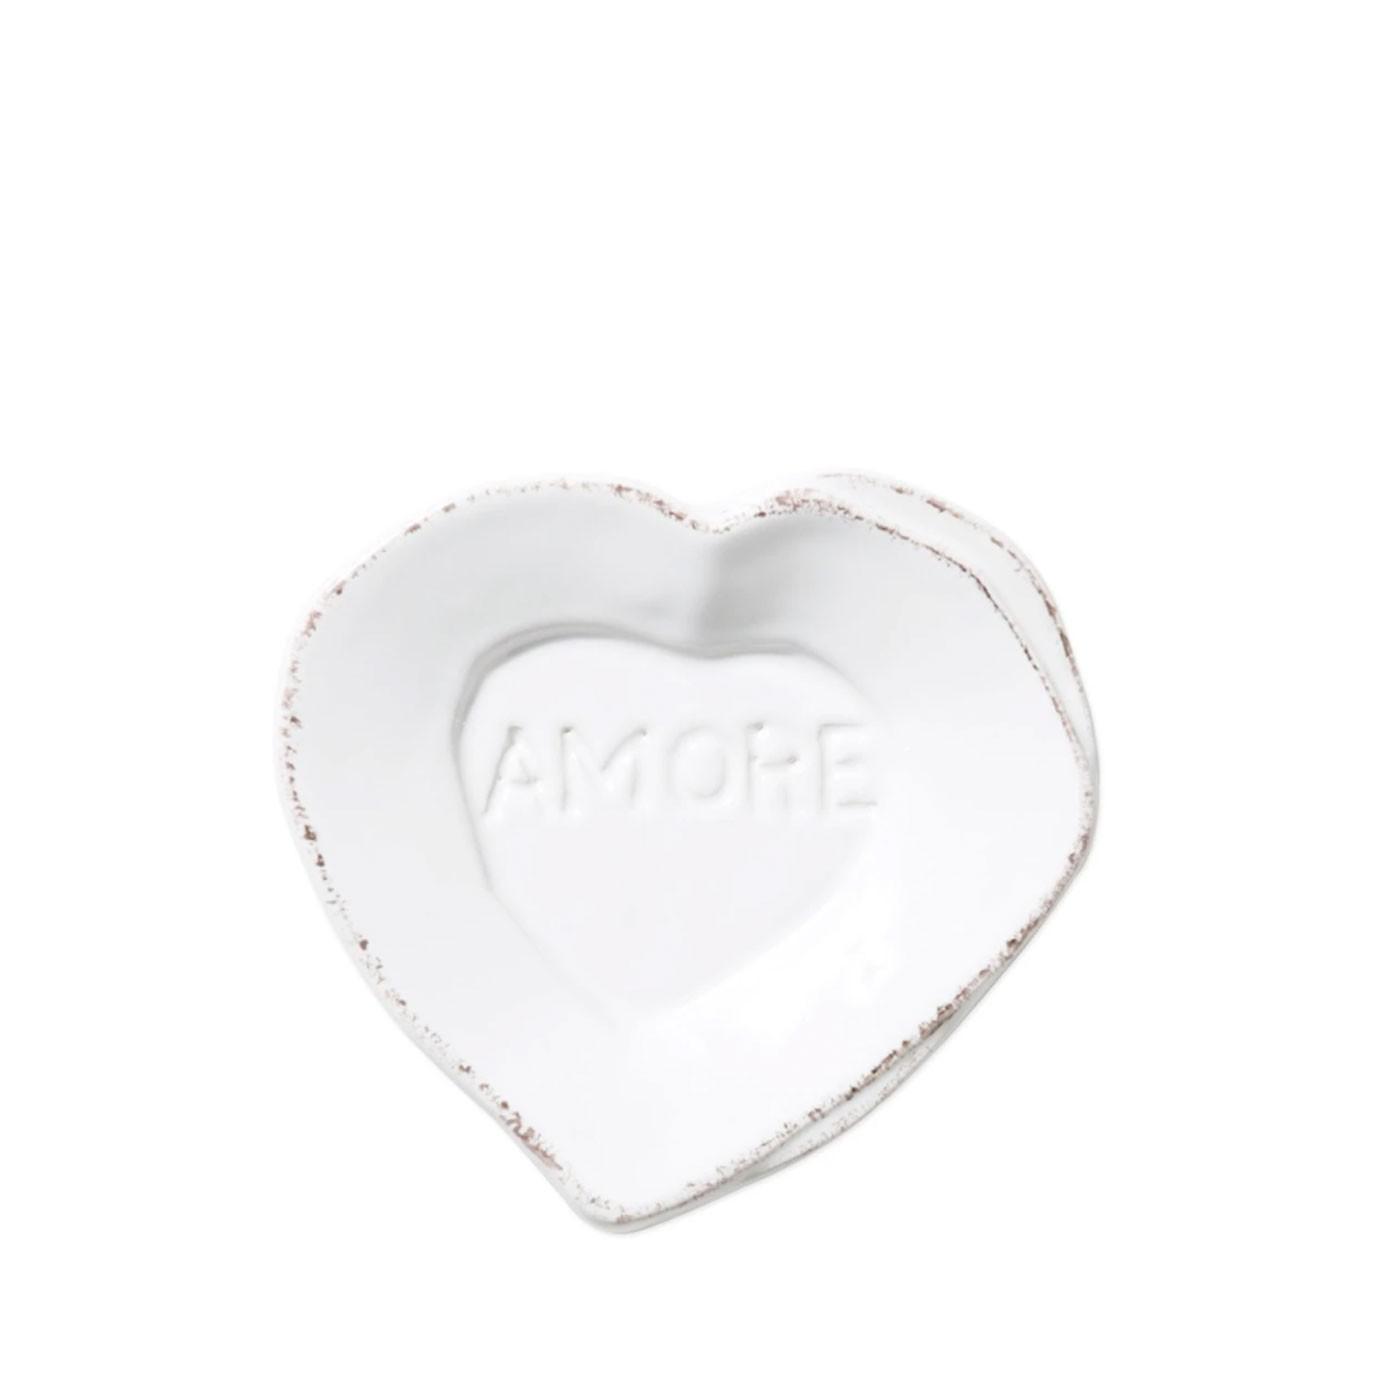 Lastra White Heart Mini Amore Plate - Vietri | Eataly.com